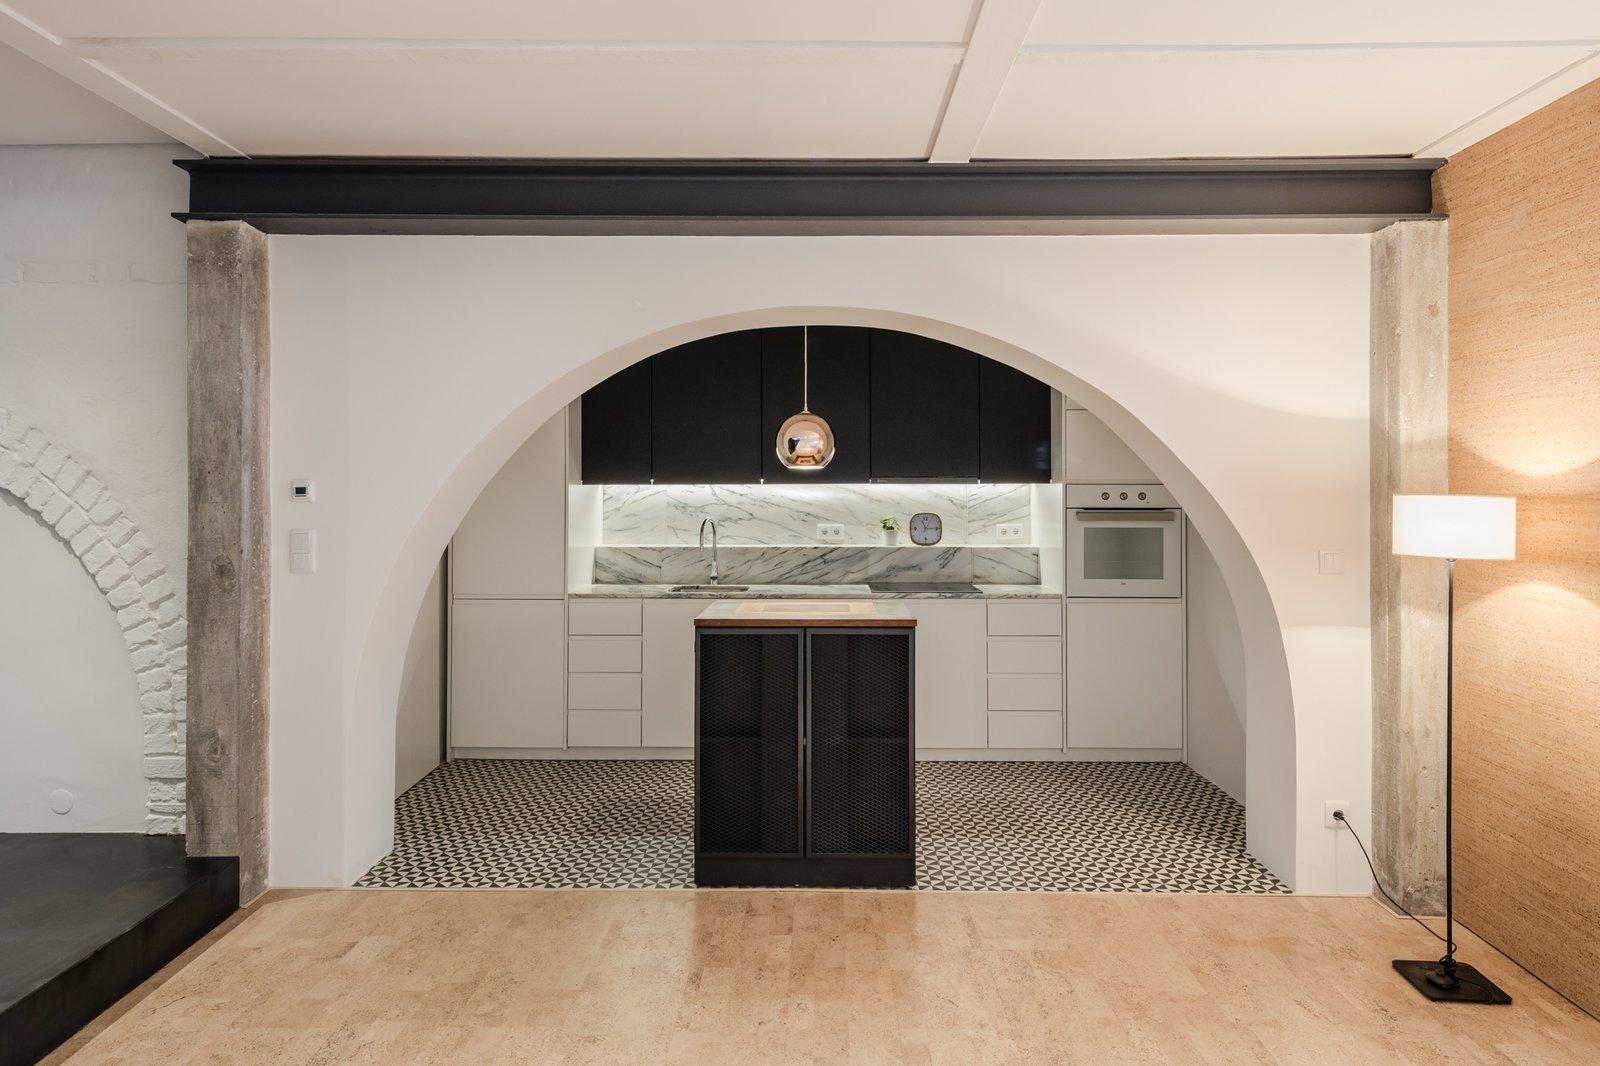 Kitchen, Marble Counter, White Cabinet, Ceramic Tile Floor, Wall Oven, Undermount Sink, Marble Backsplashe, and Pendant Lighting  Rua Maria Loft